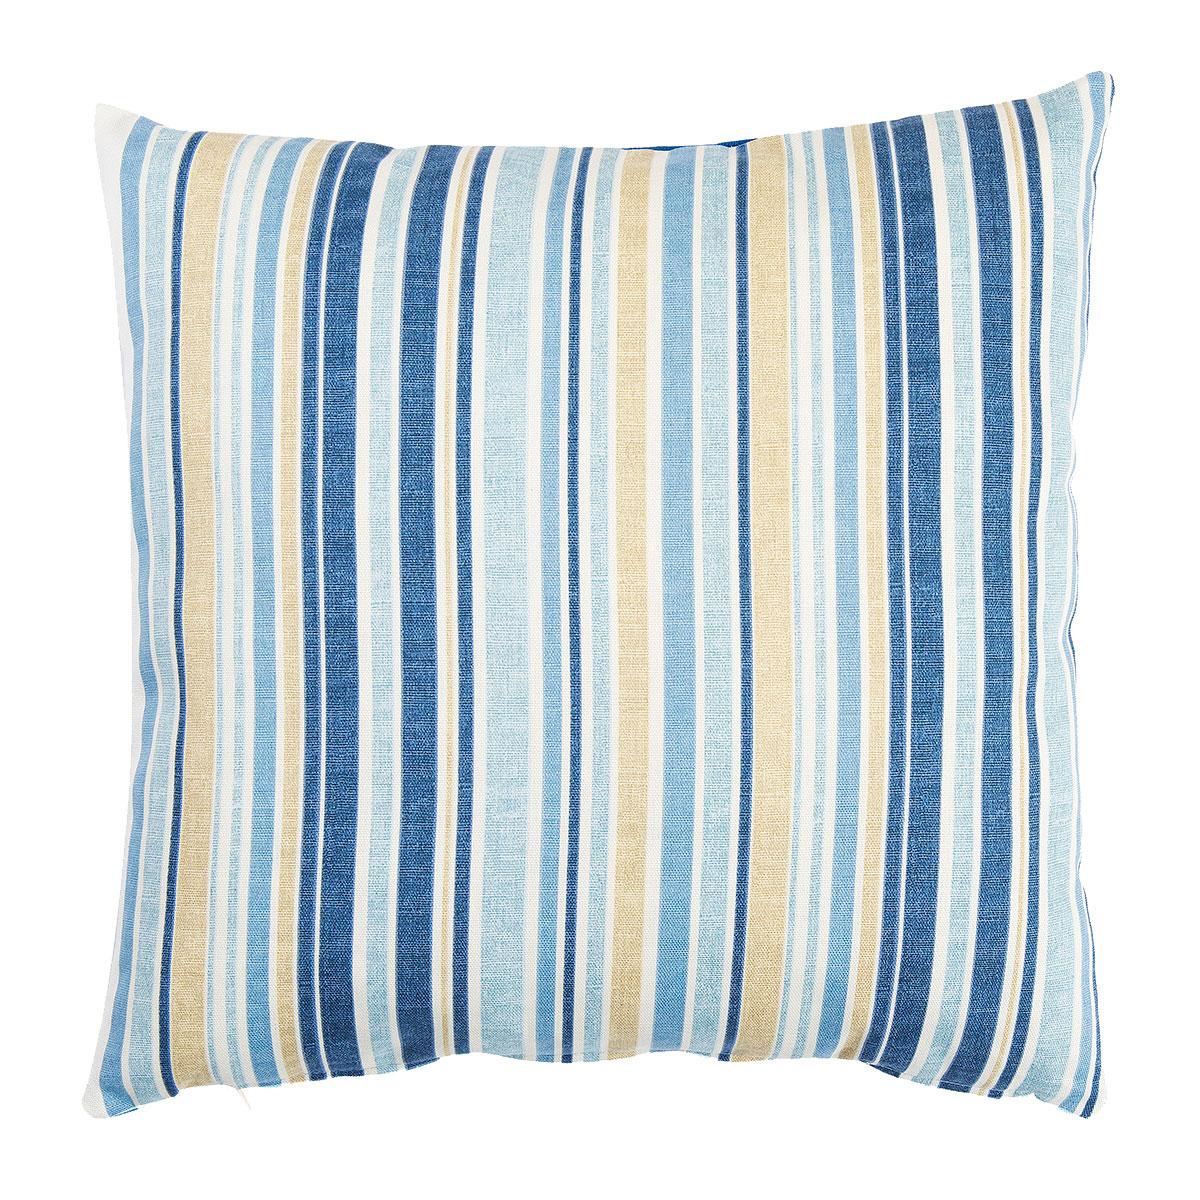 Cotton Print Blue Stripes Cotton Print Cushions Sw Living